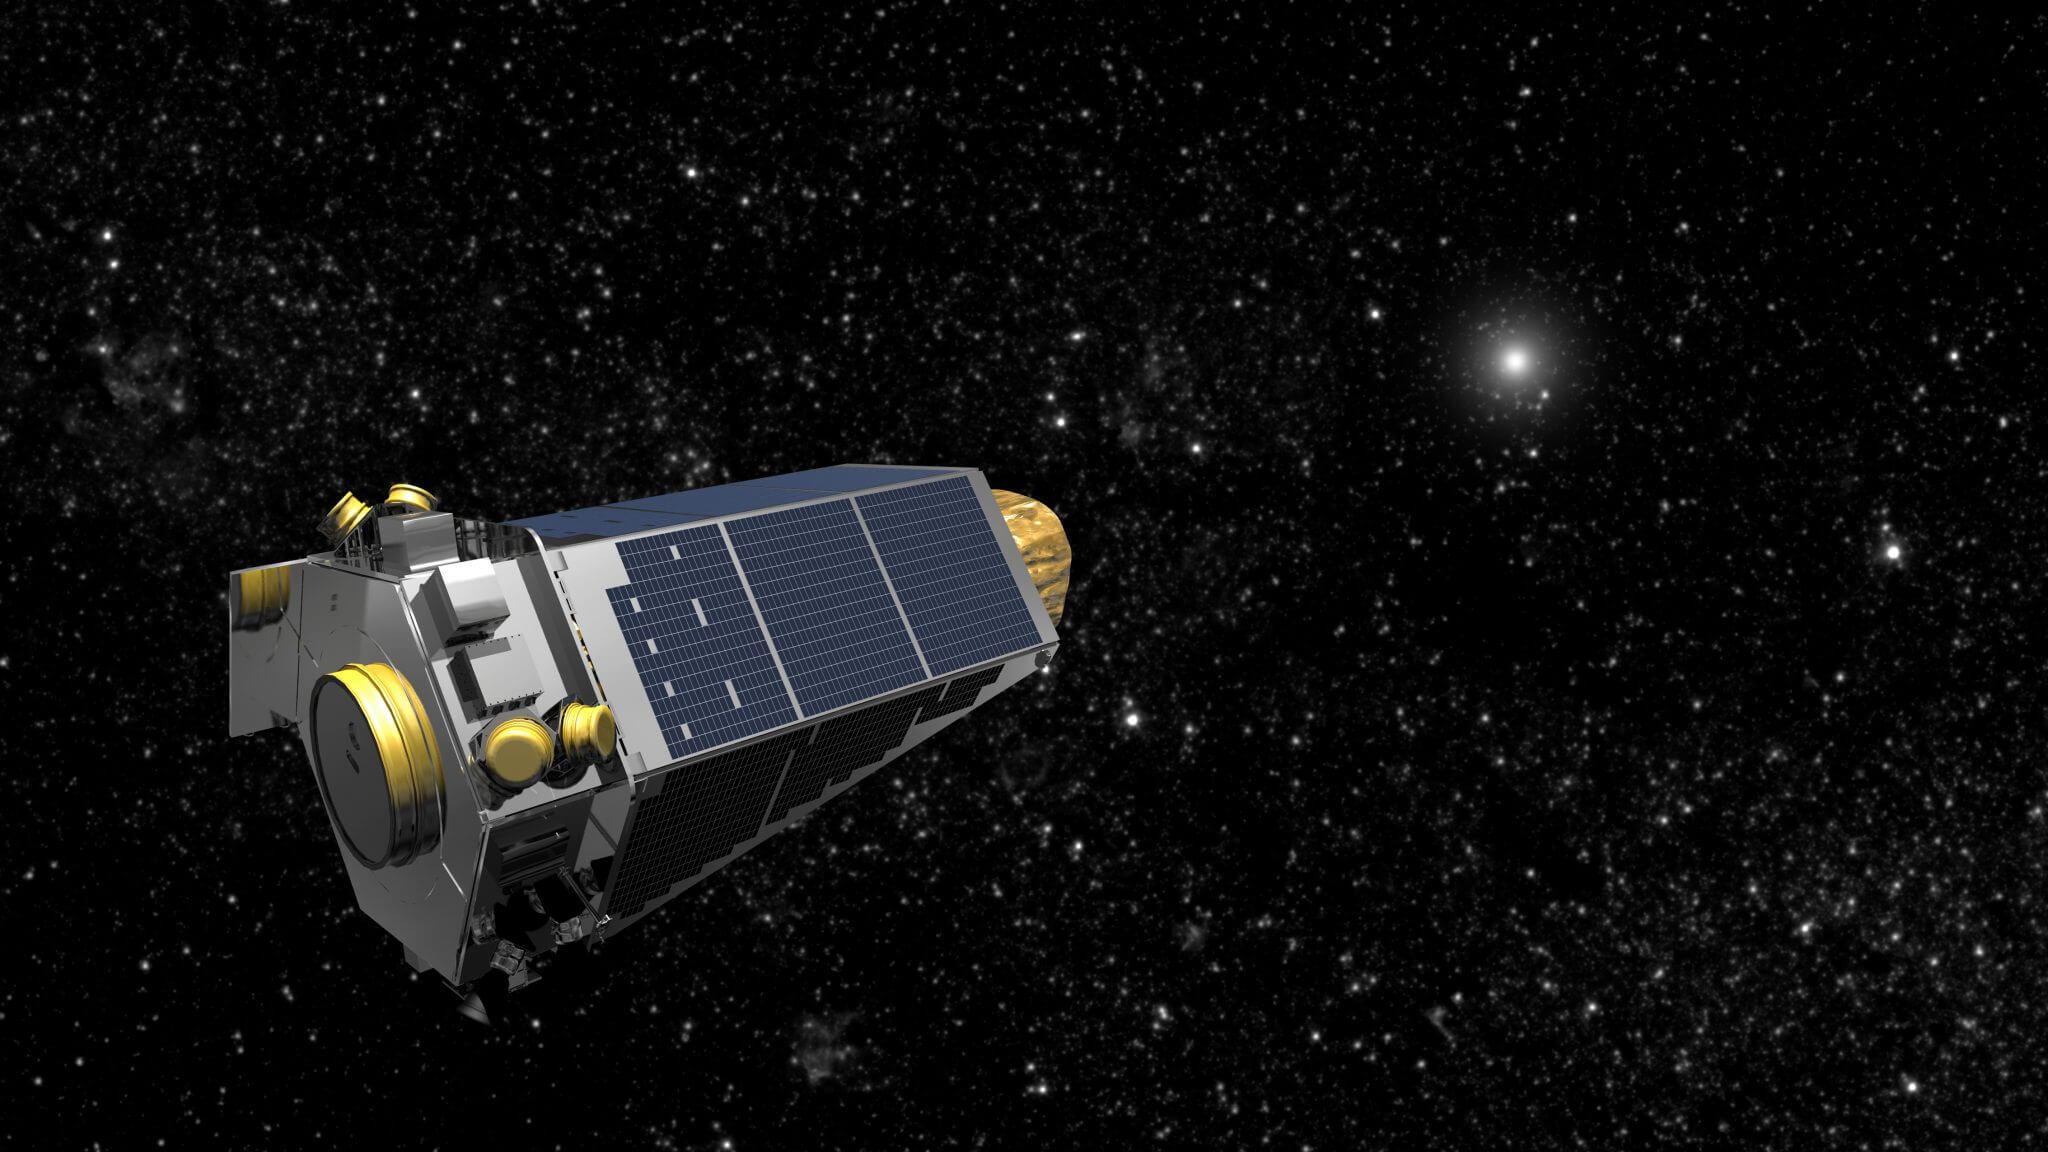 kepler spacecraft discoveries - HD2048×1152